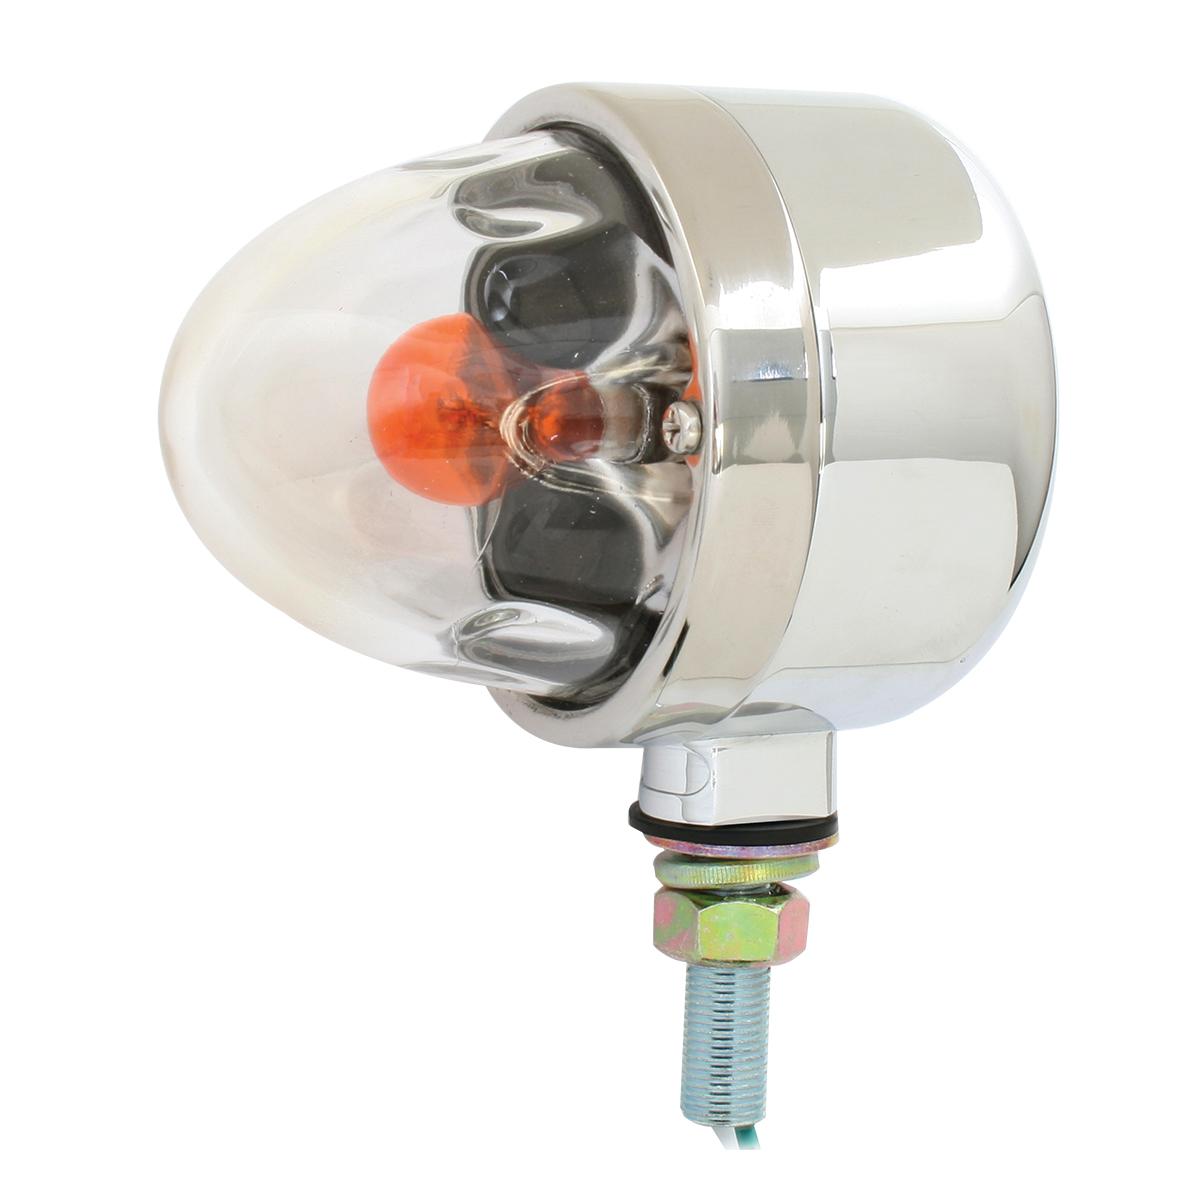 78080 Chrome Die Cast Auxiliary Clear Glass Lens Pedestal Light